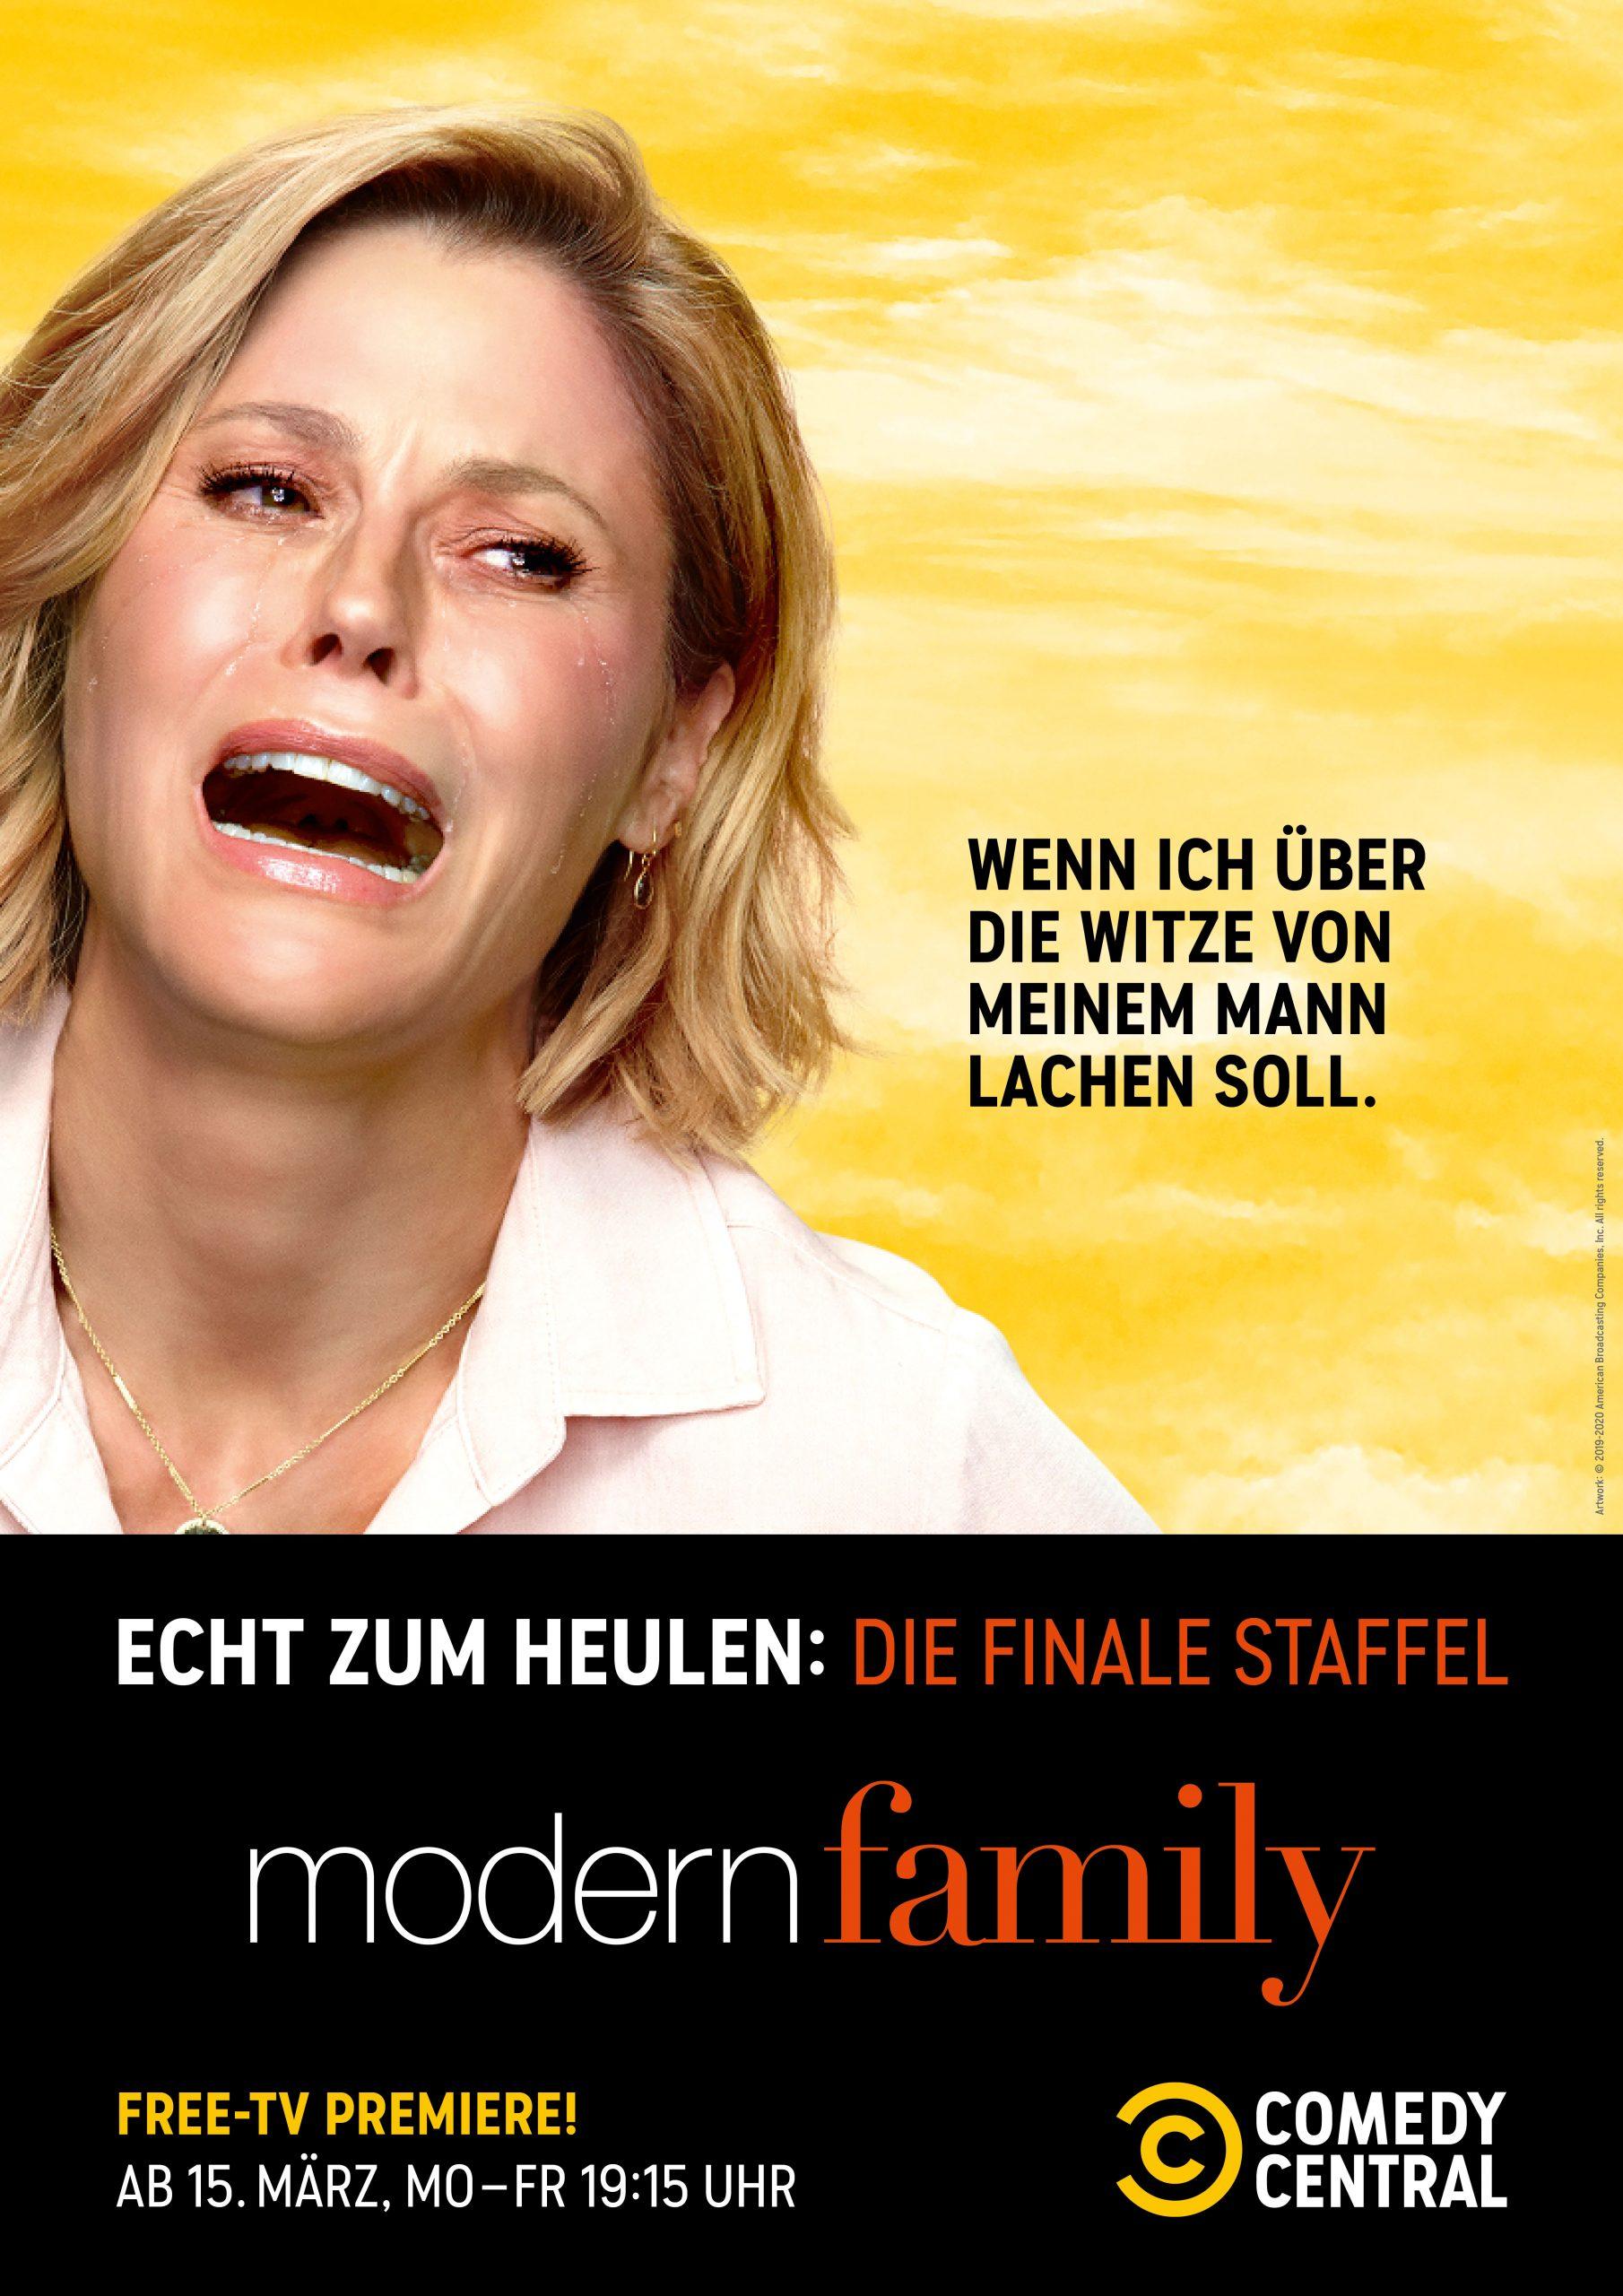 210210_CC_Modern_Family_MasterLayouts_Hochformat3